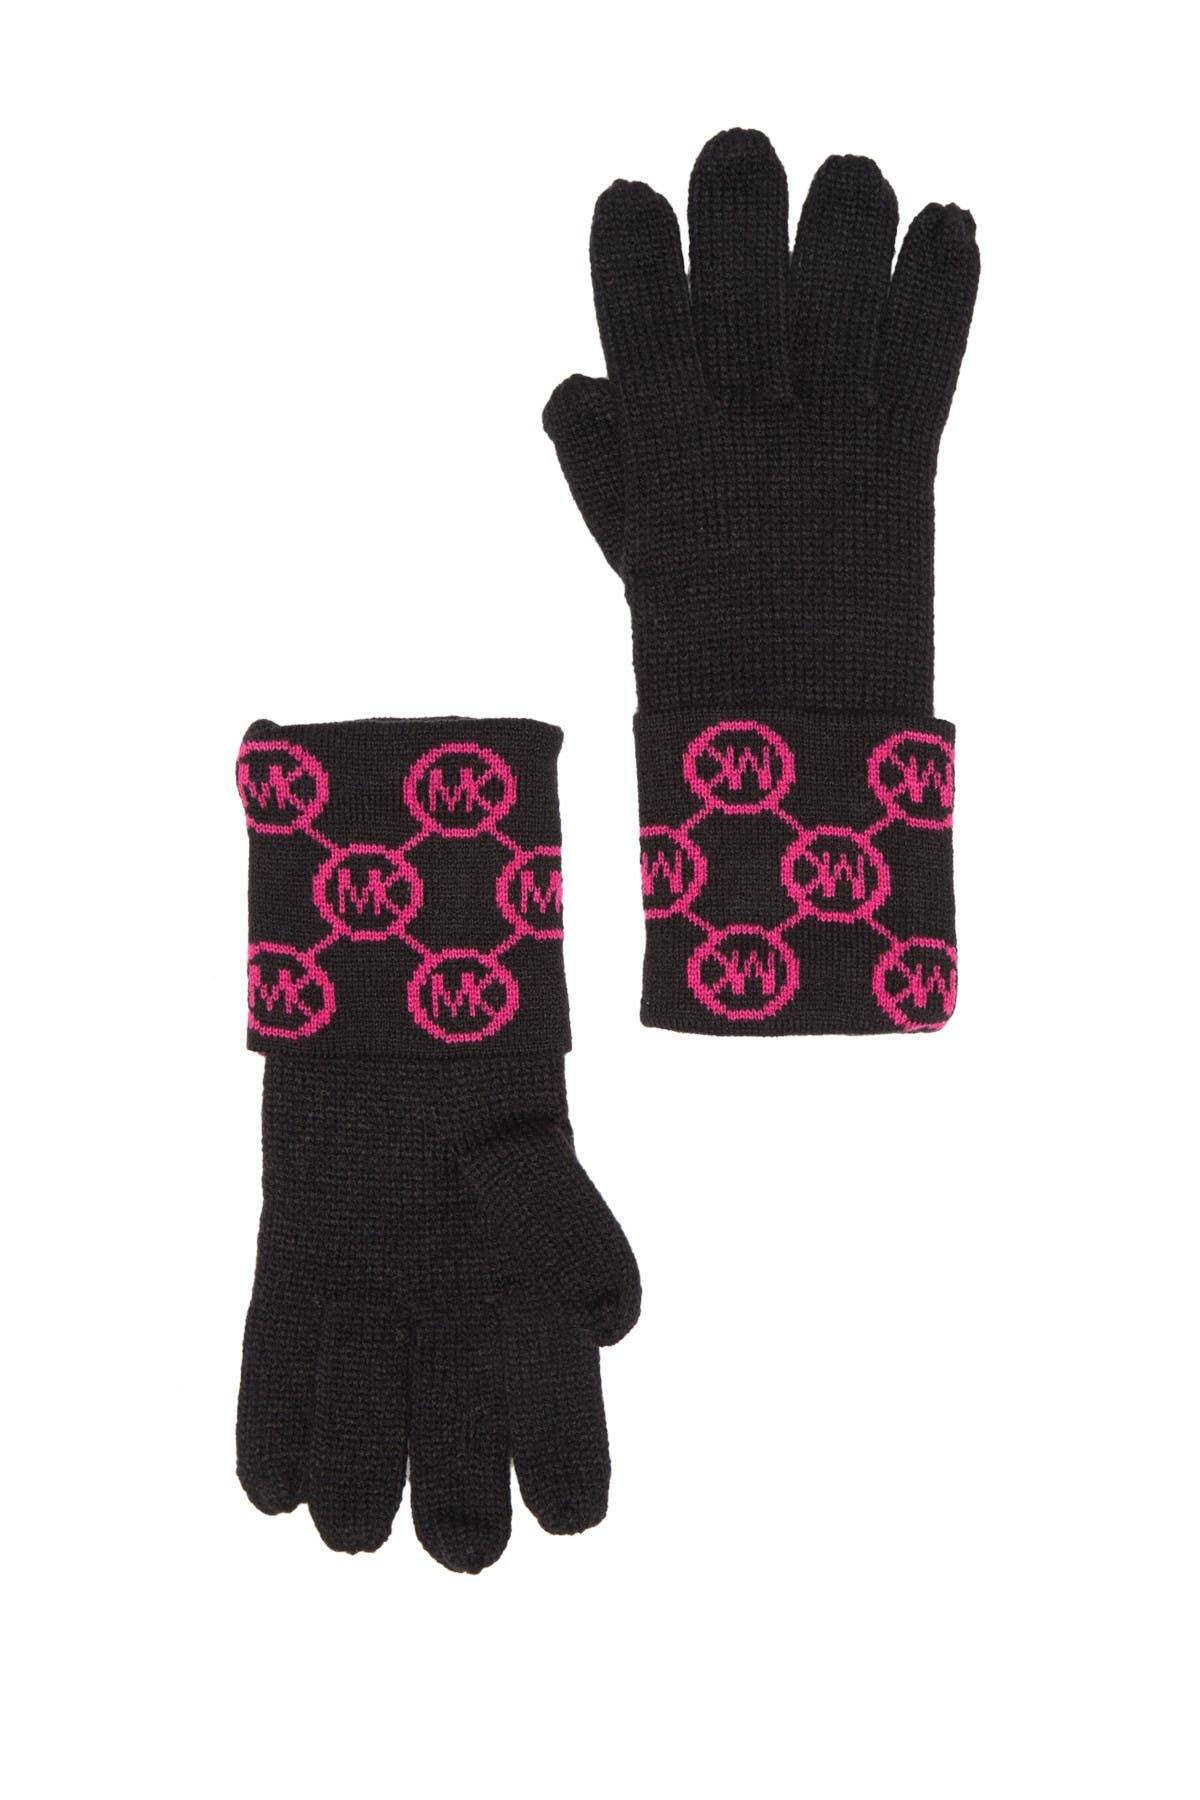 Image of Michael Kors Jet Set Logo Cuff Gloves